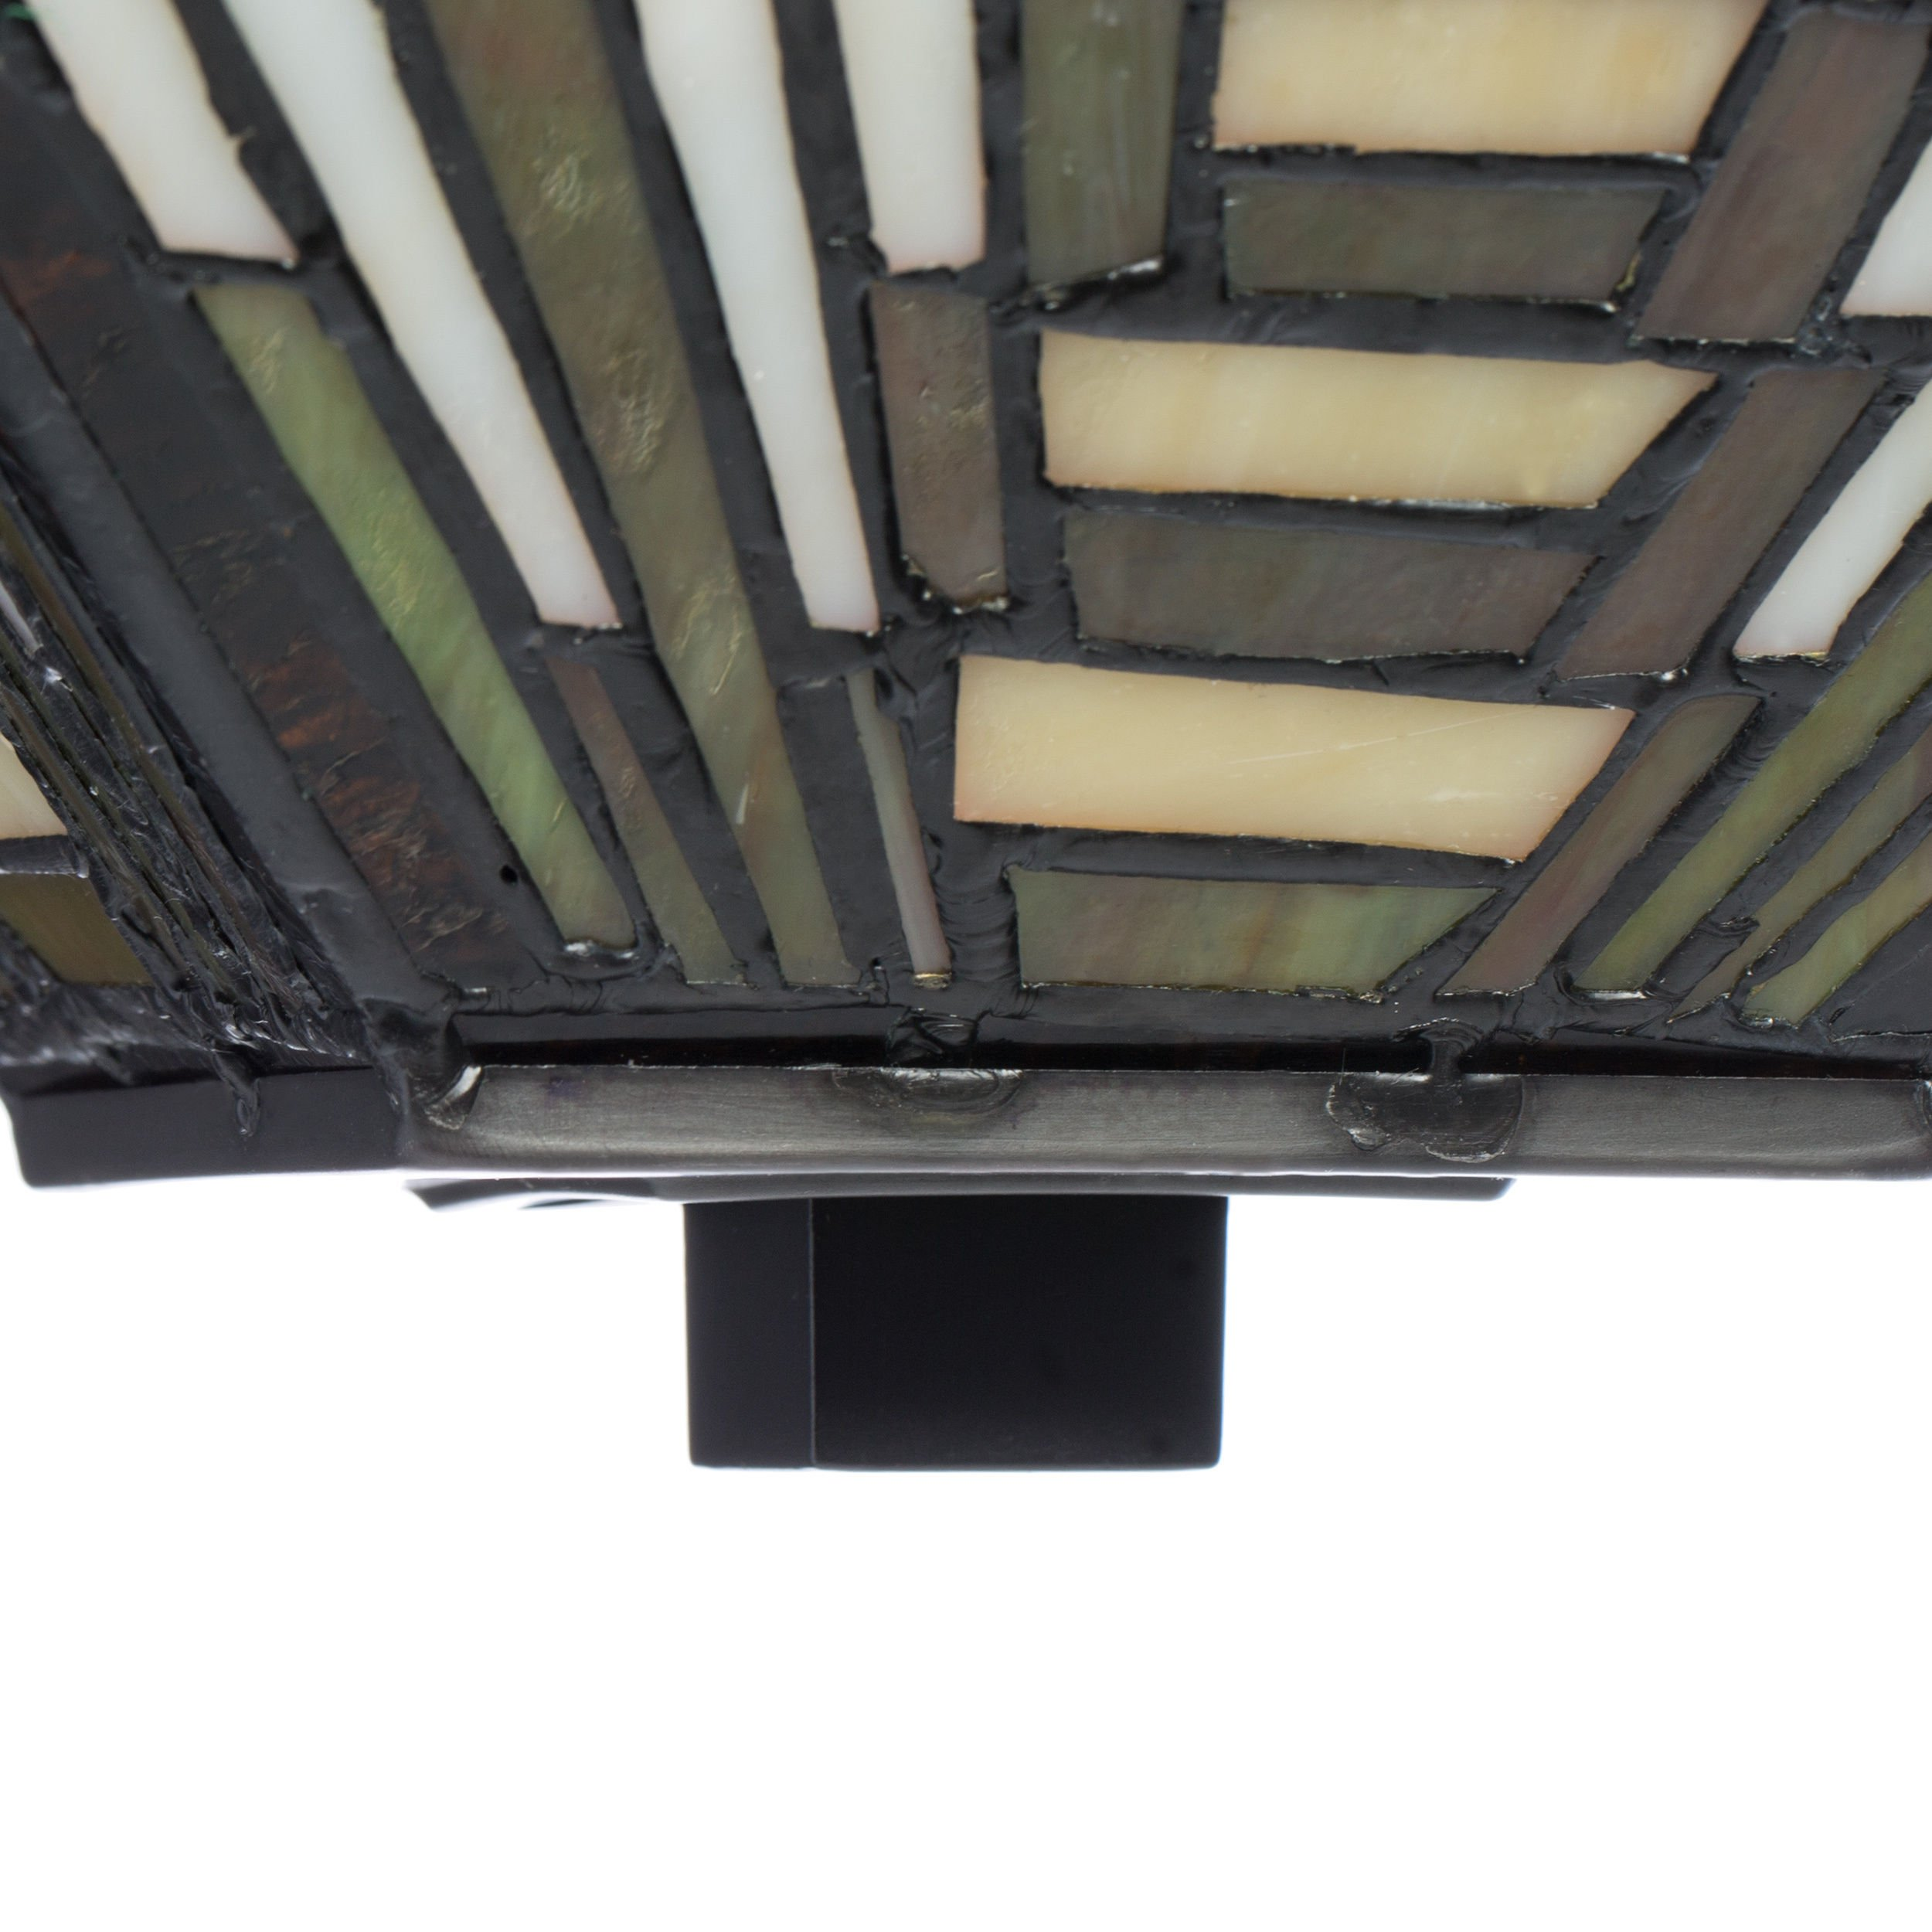 Tiffany-style Frank Lloyd Wright Mission Ceiling Lamp by Warehouse of Tiffany